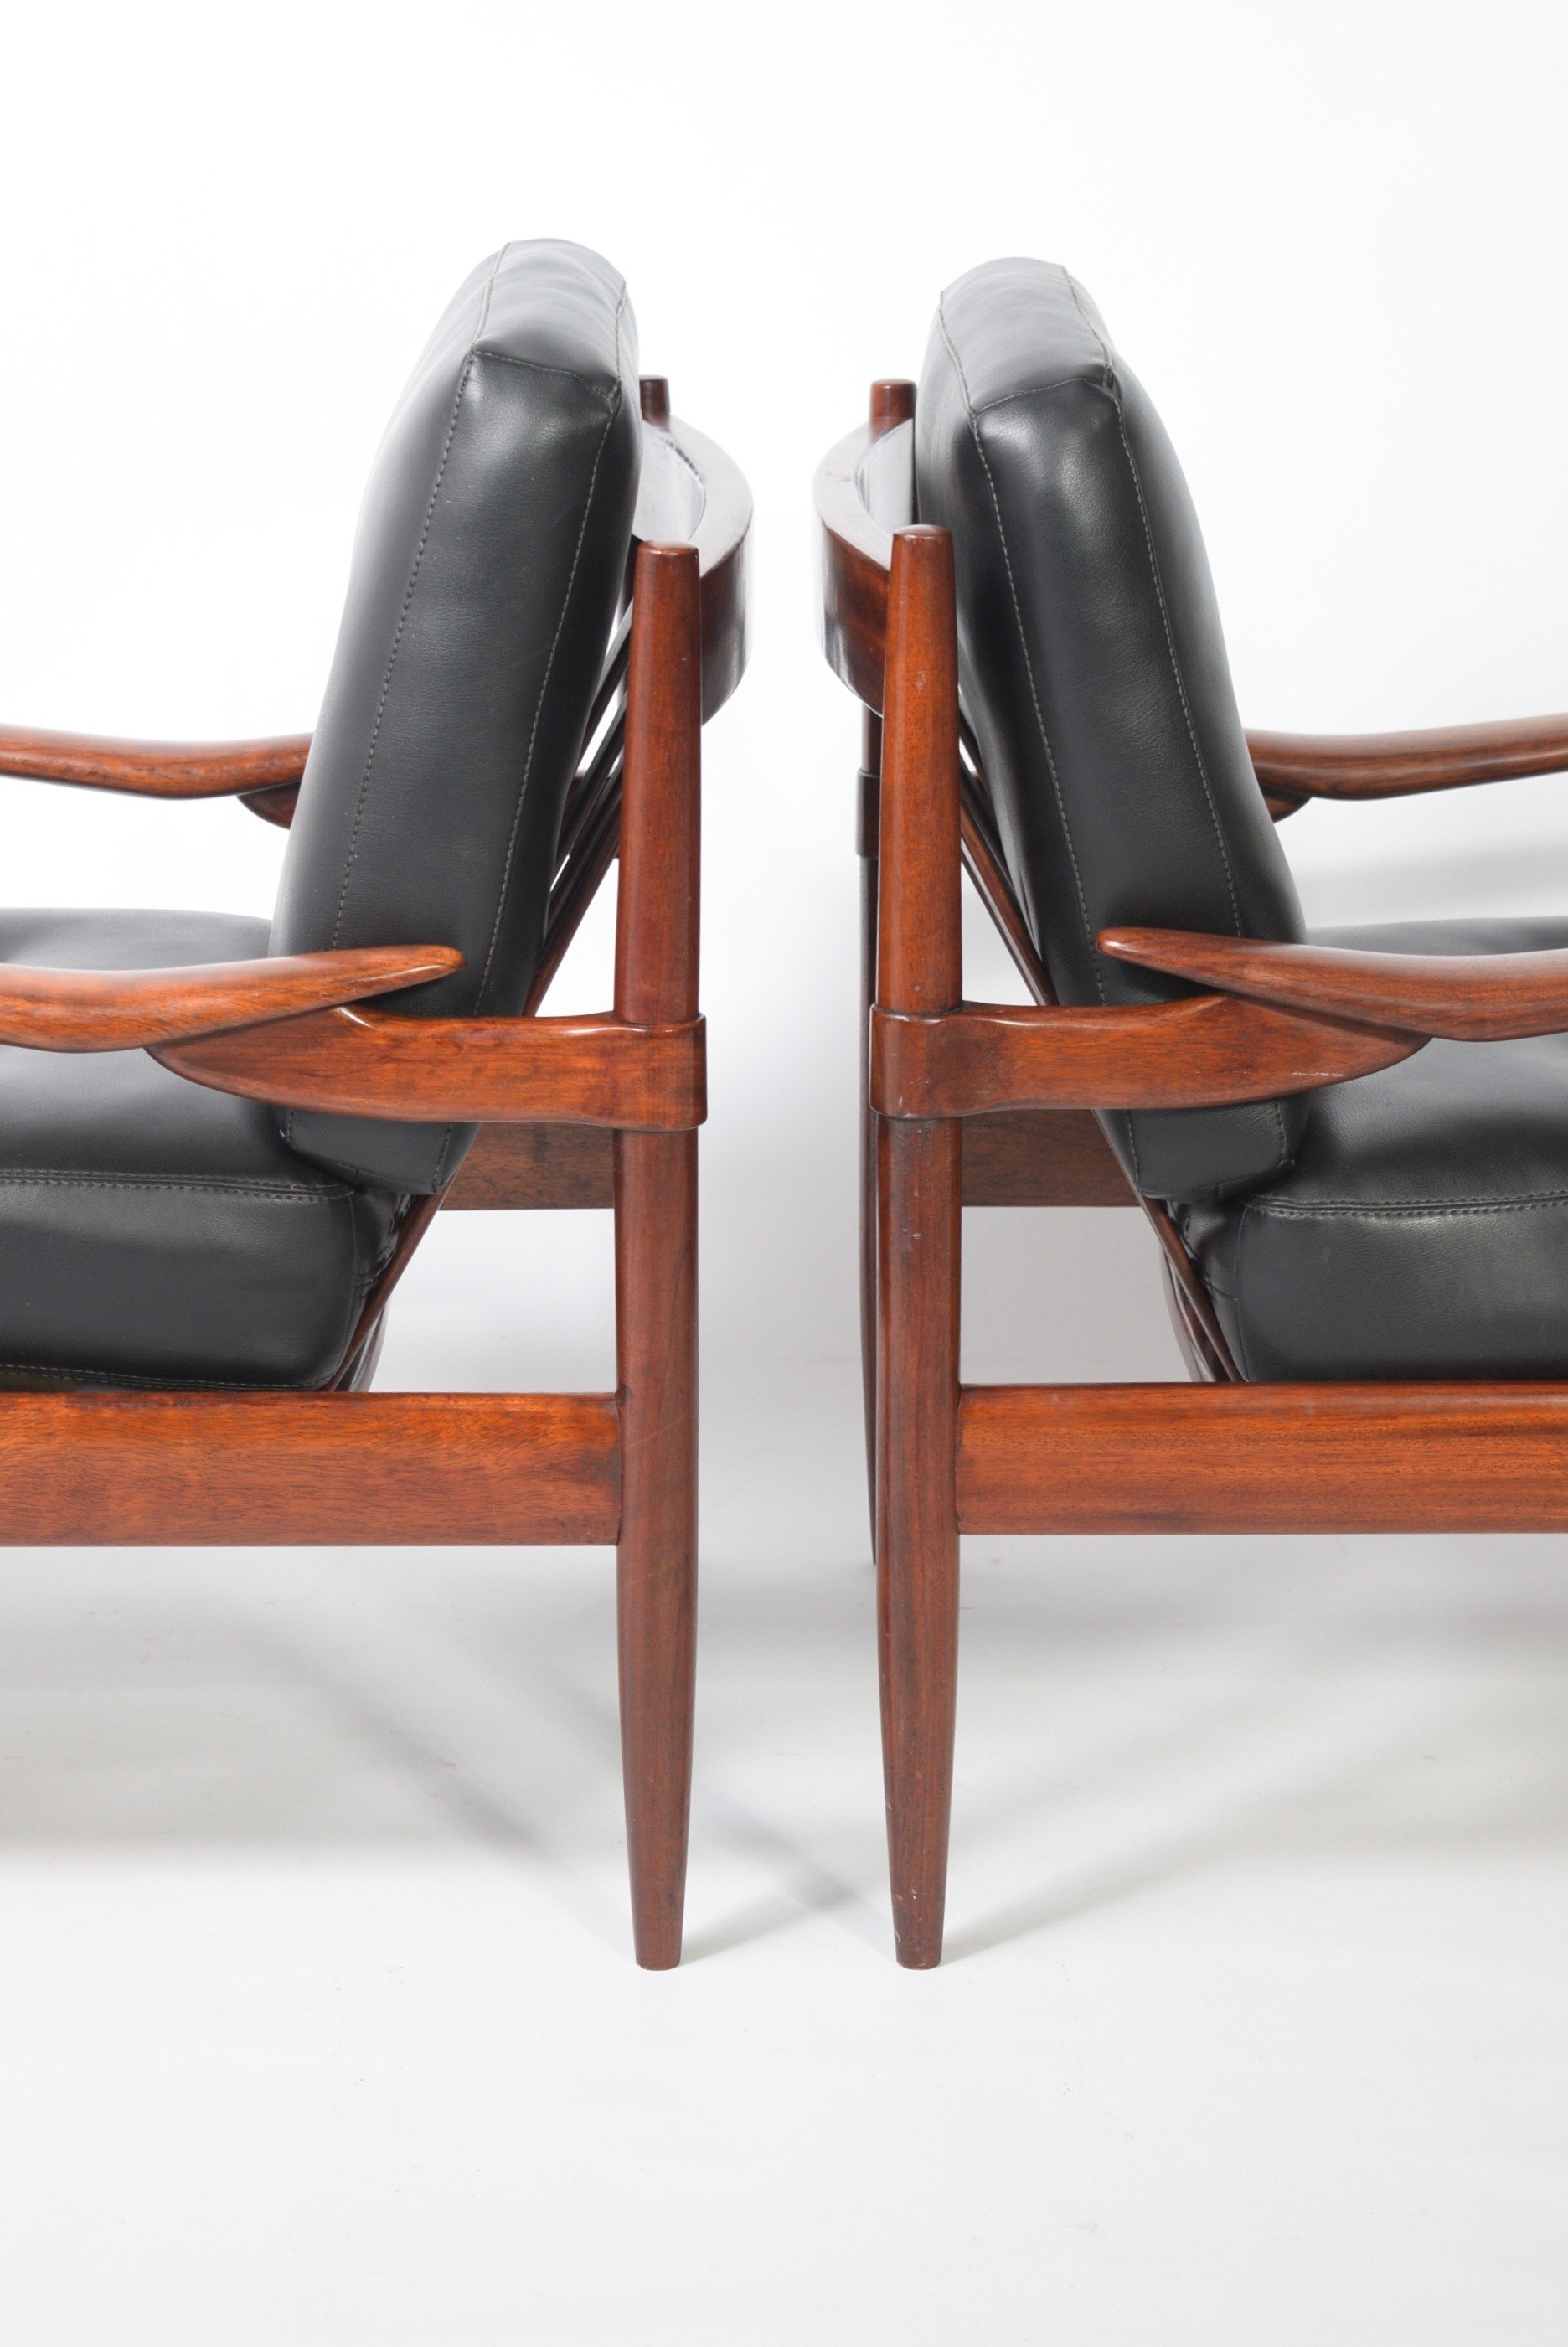 Set of 2 vintage easy chairs Danish design 1960s Design Market